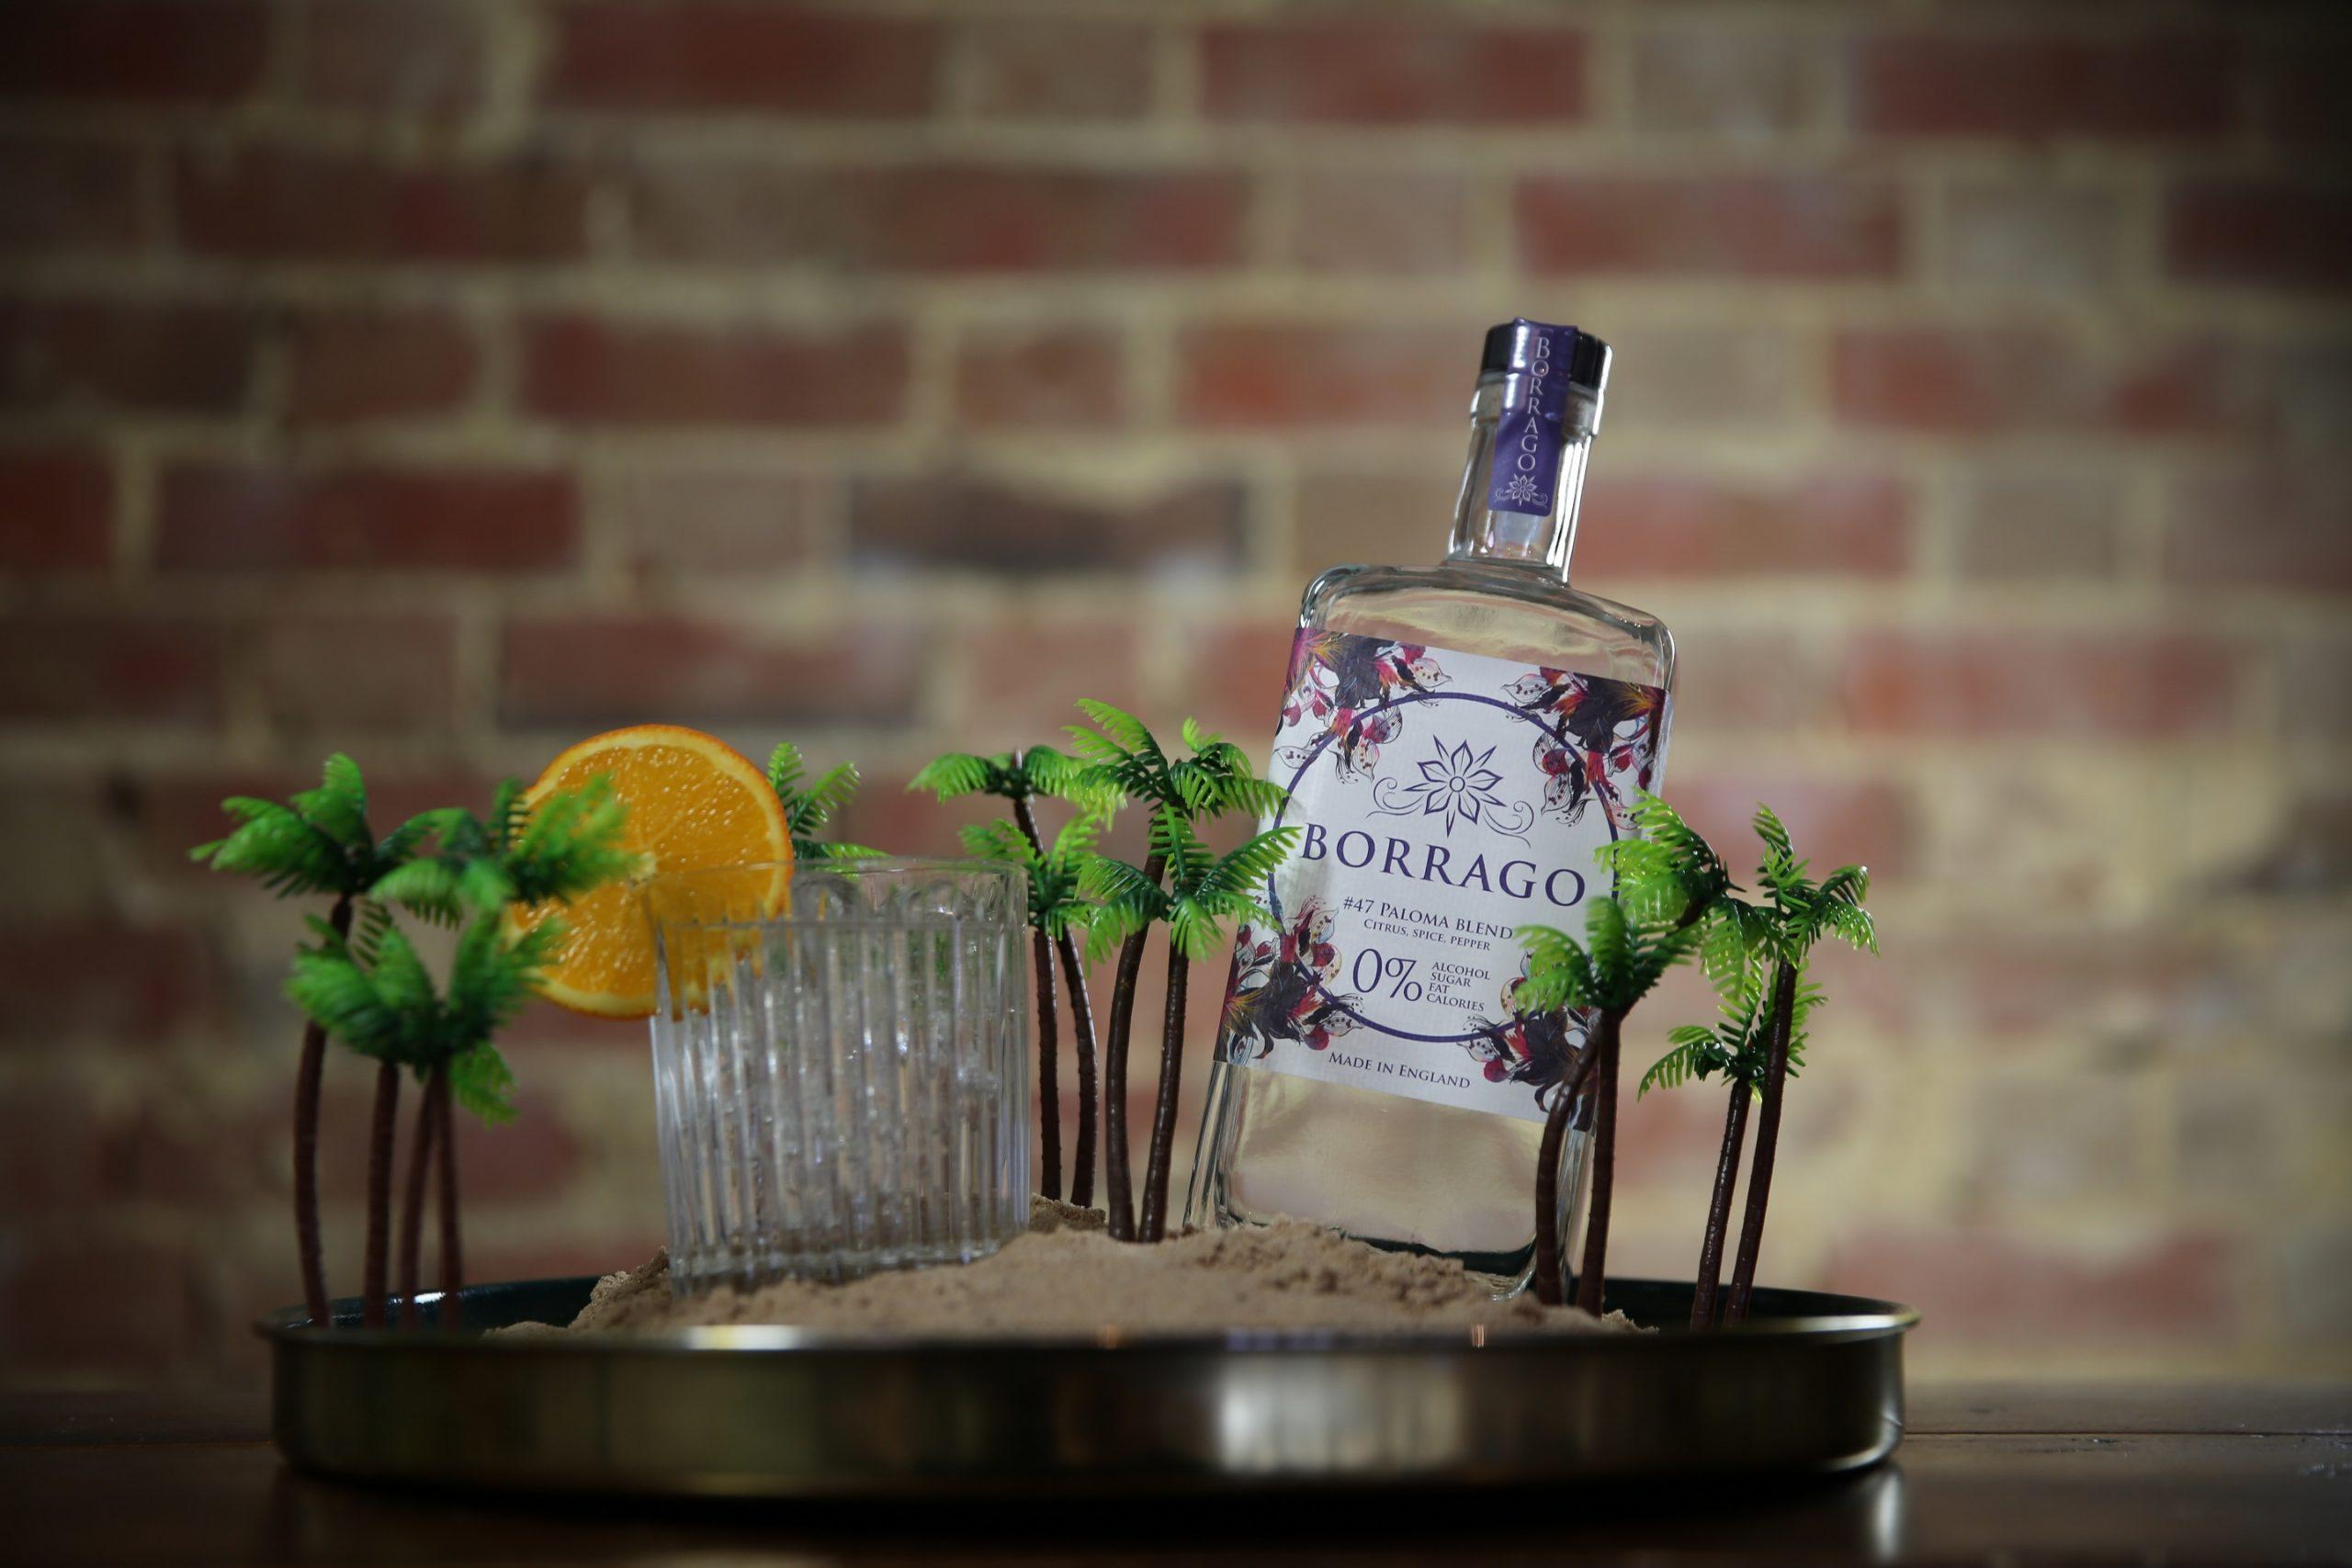 Borrago Launches Its Non-alcoholic Spirit In Dubai photo